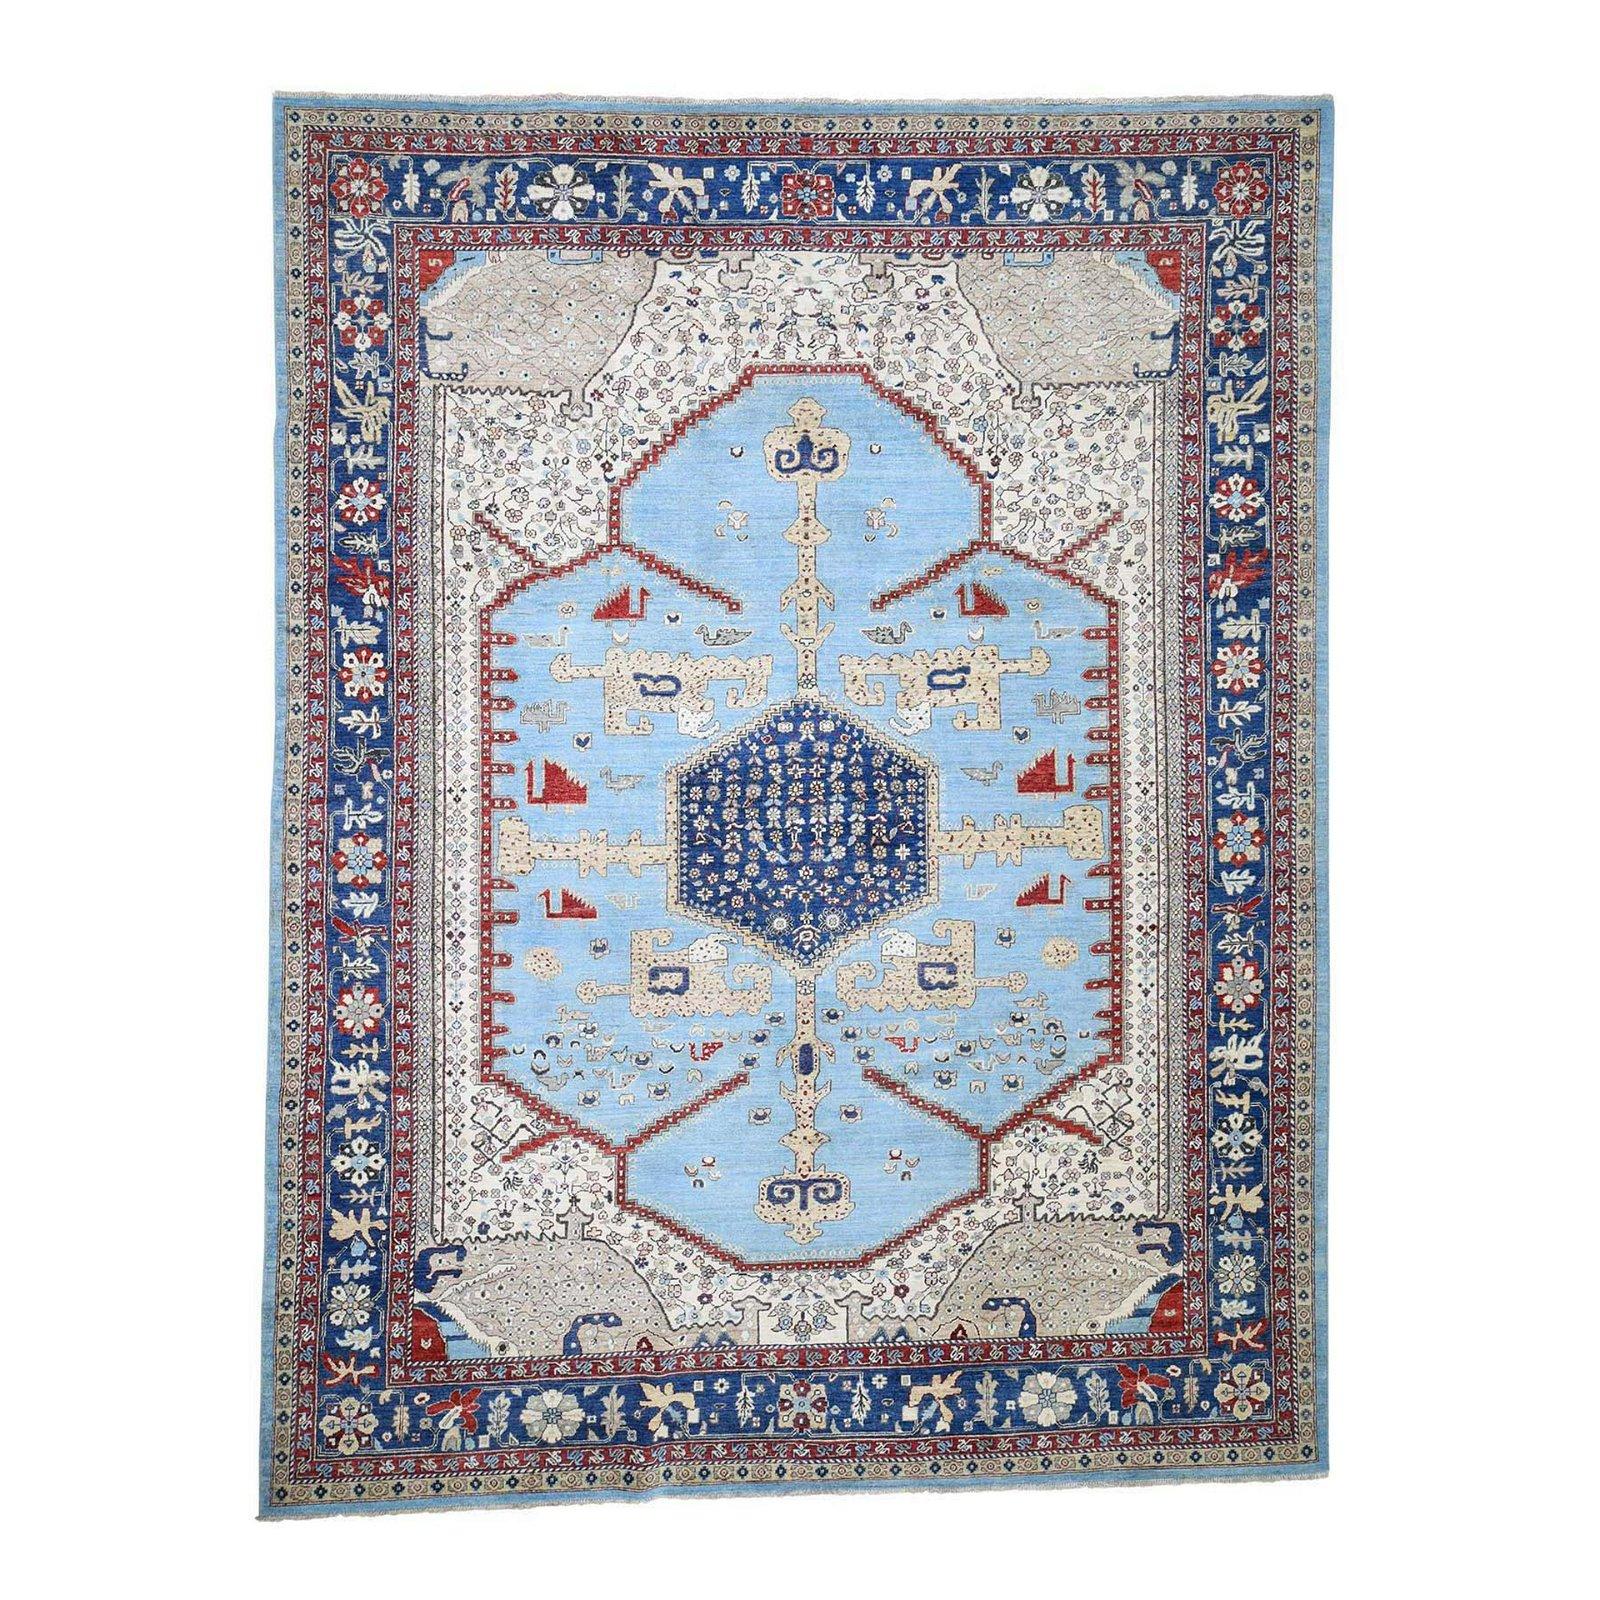 d Bakshaish High KPSI Hand-Knotted Oriental Rug